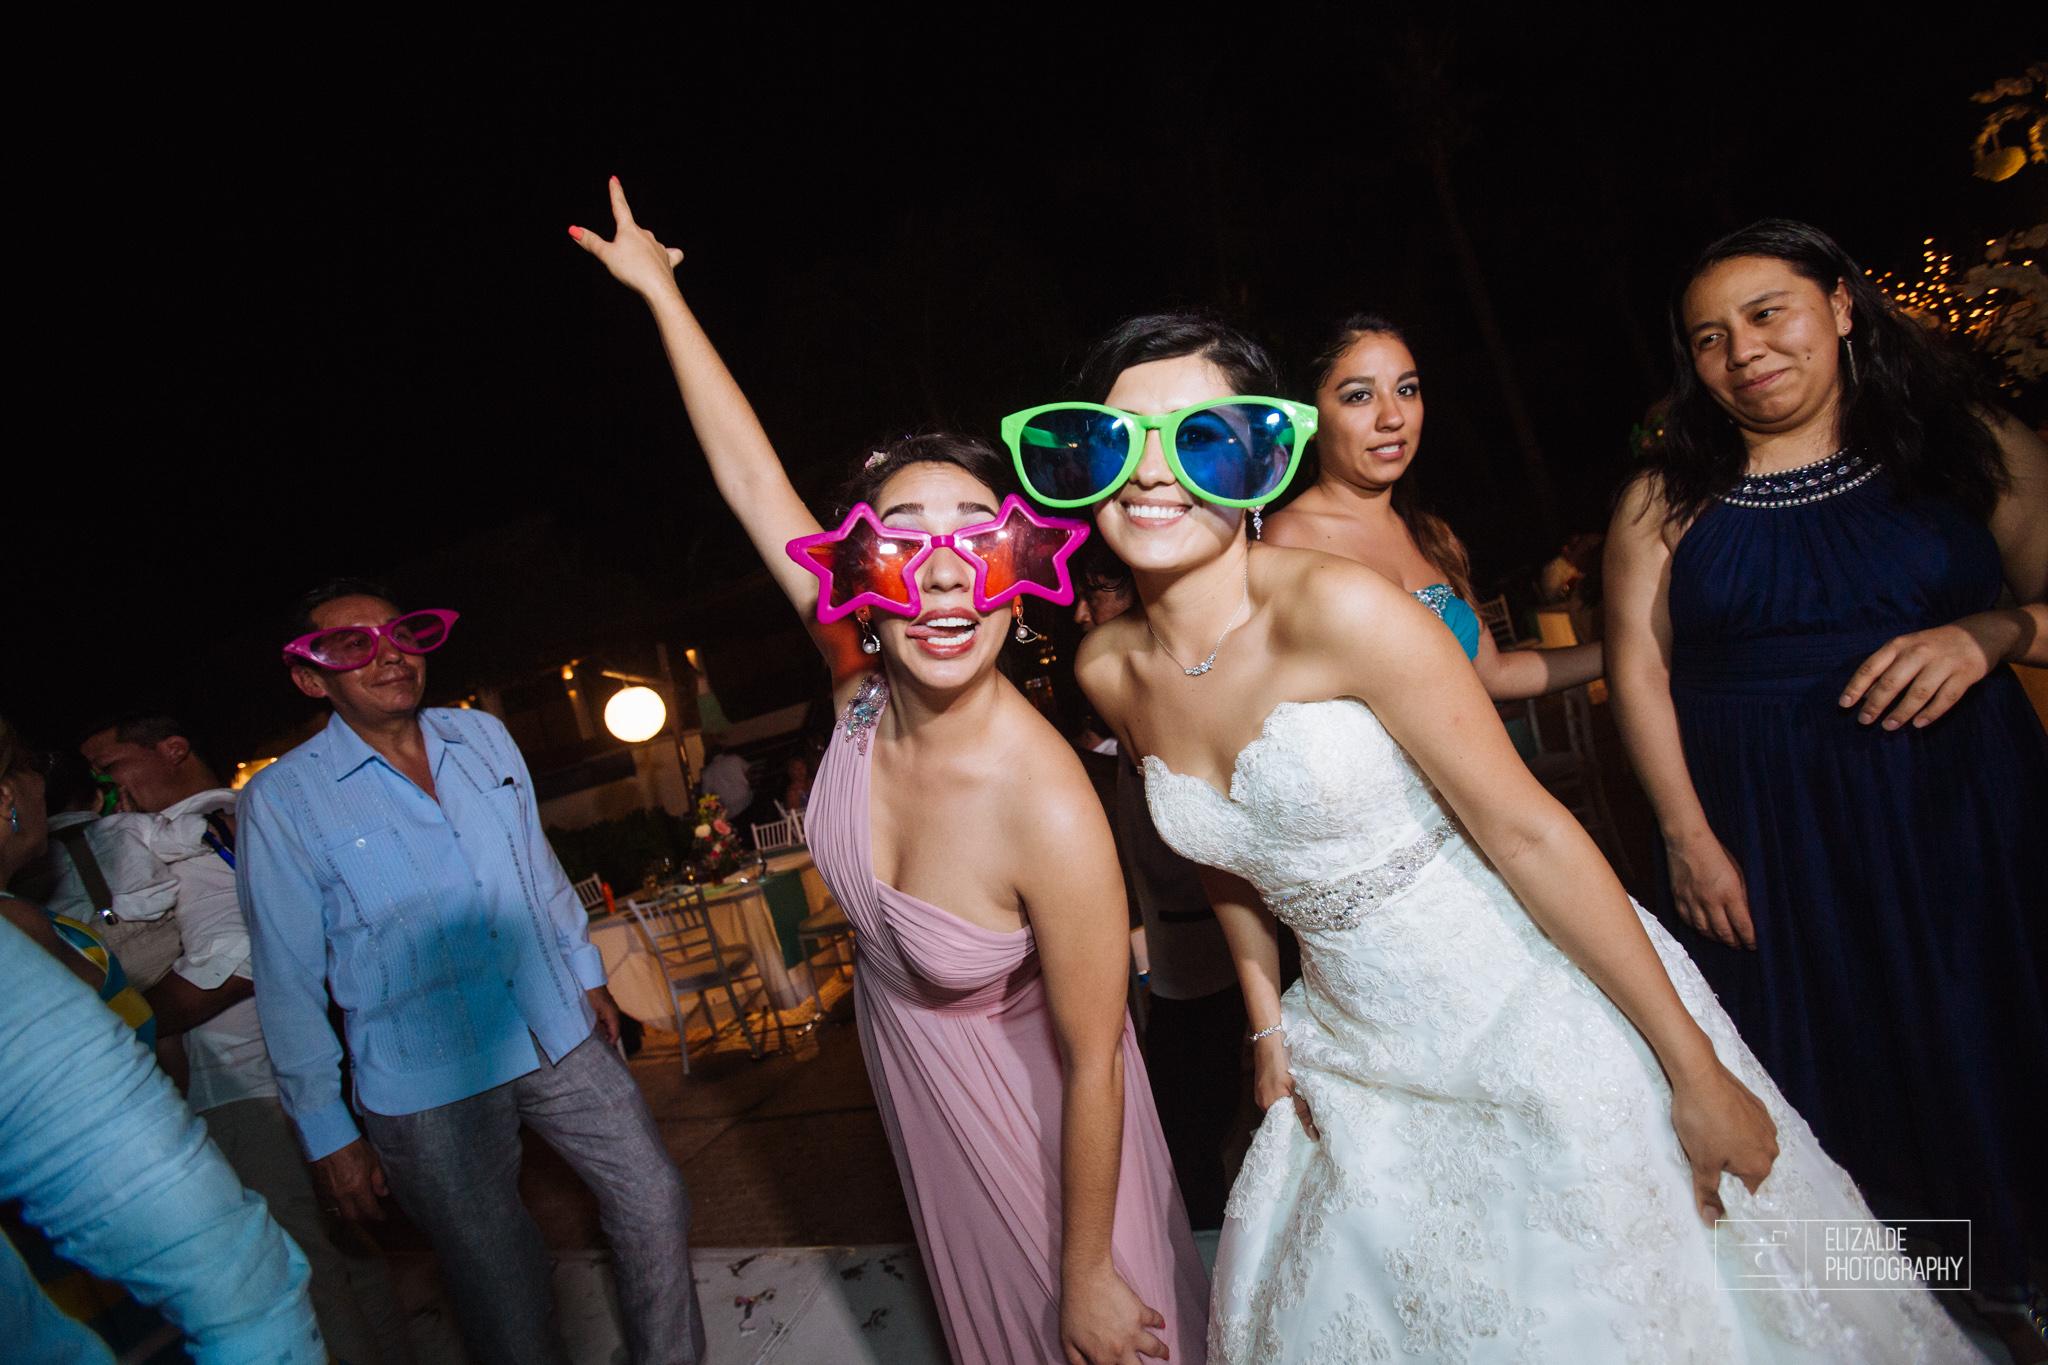 Pay and Ferran_Acapulco_Destination Wedding_Elizalde Photography-135.jpg